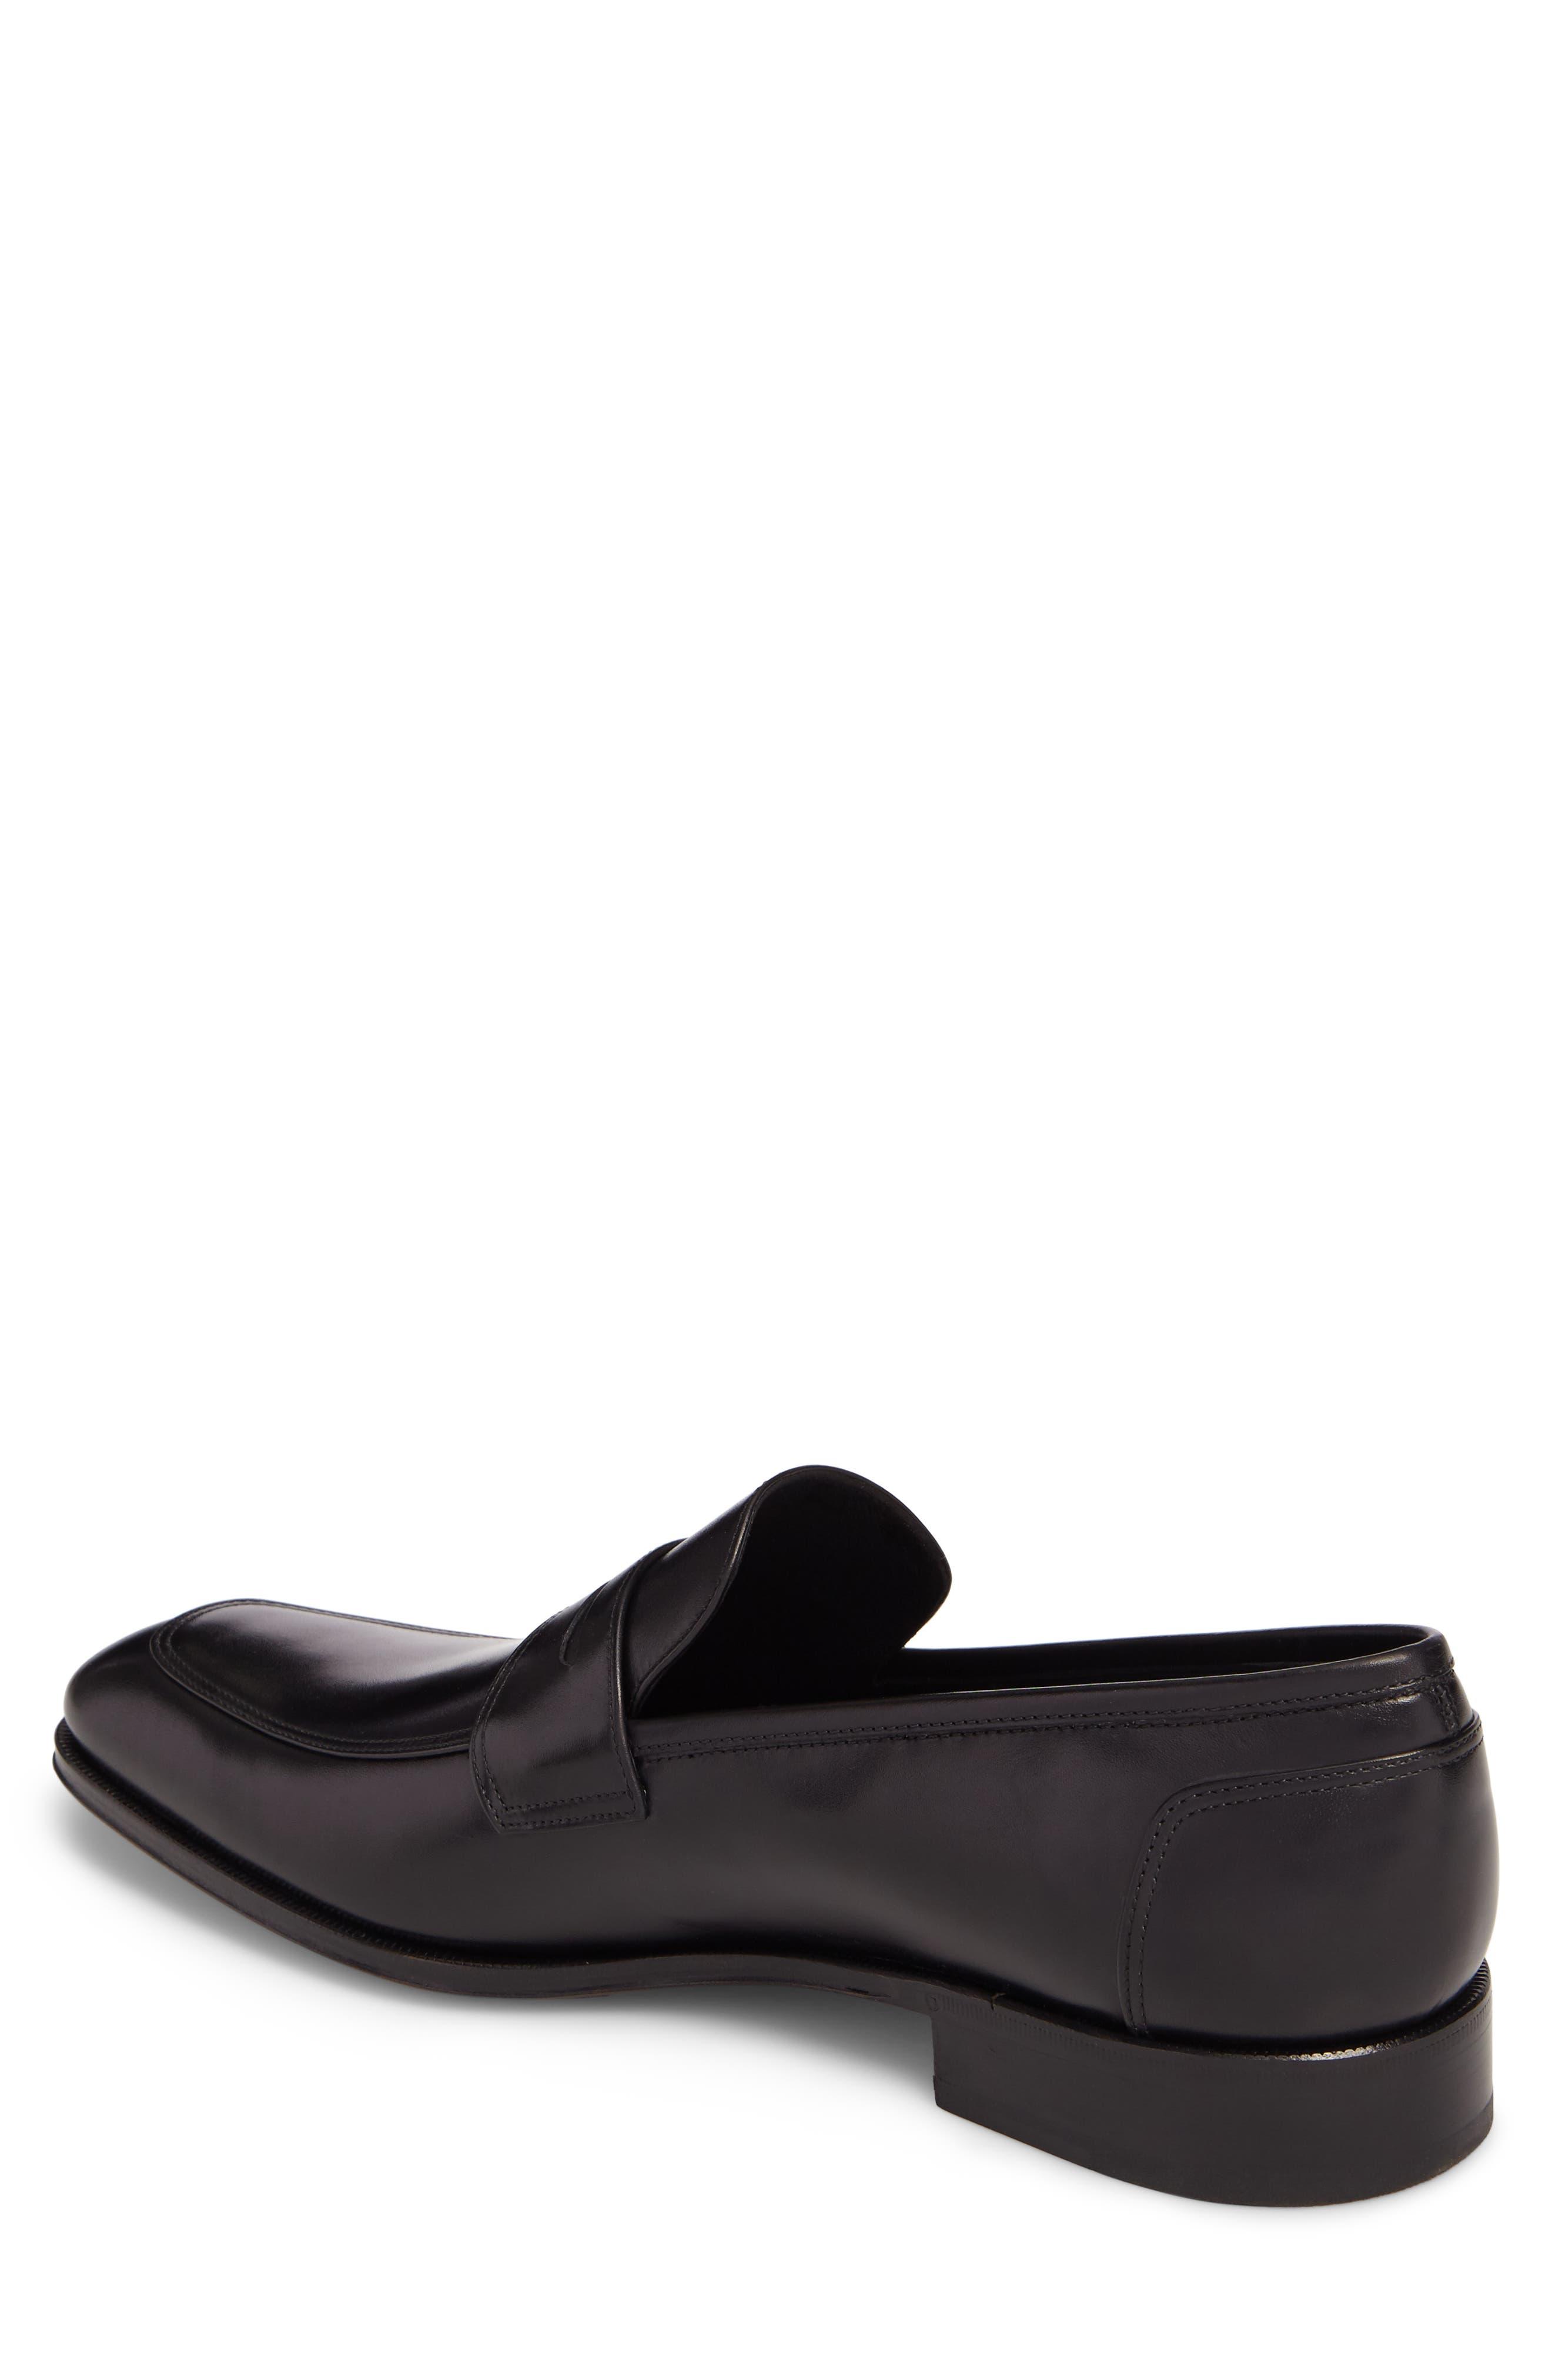 abc7c3d3e65 Salvatore Ferragamo Men s Loafers   Slip-ons